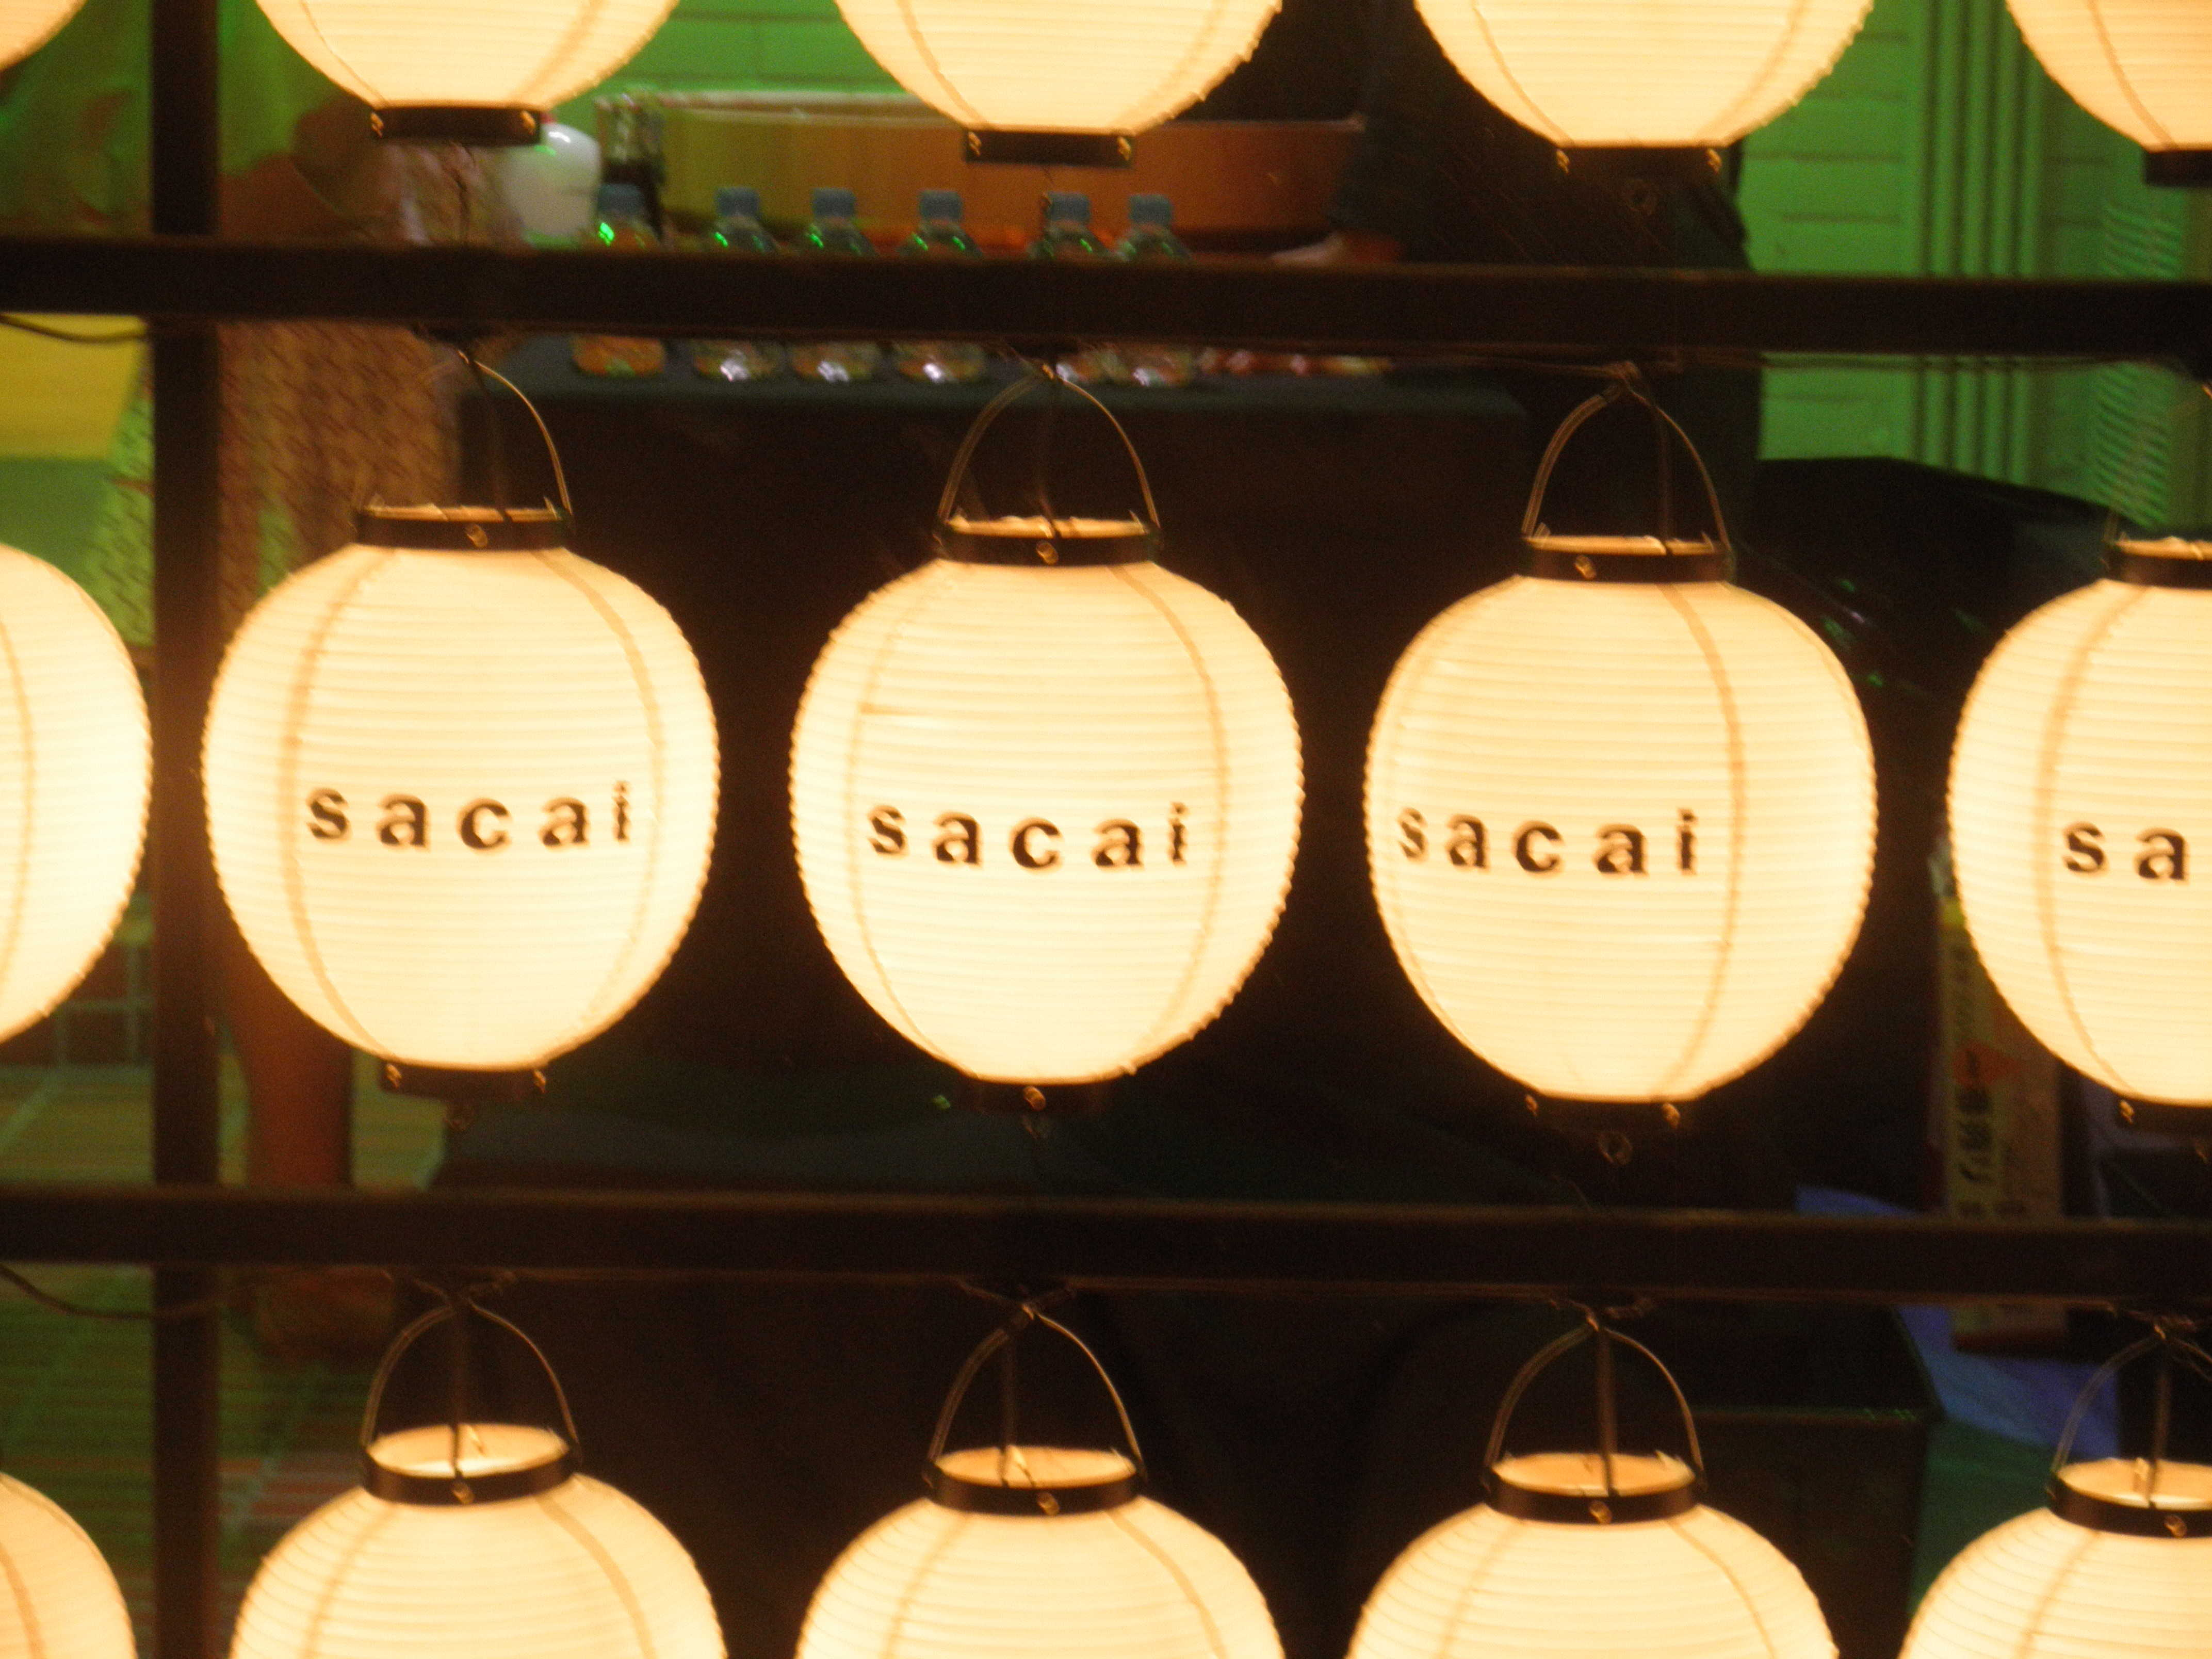 sacai 一周年記念パーティー_d0339890_12274616.jpg